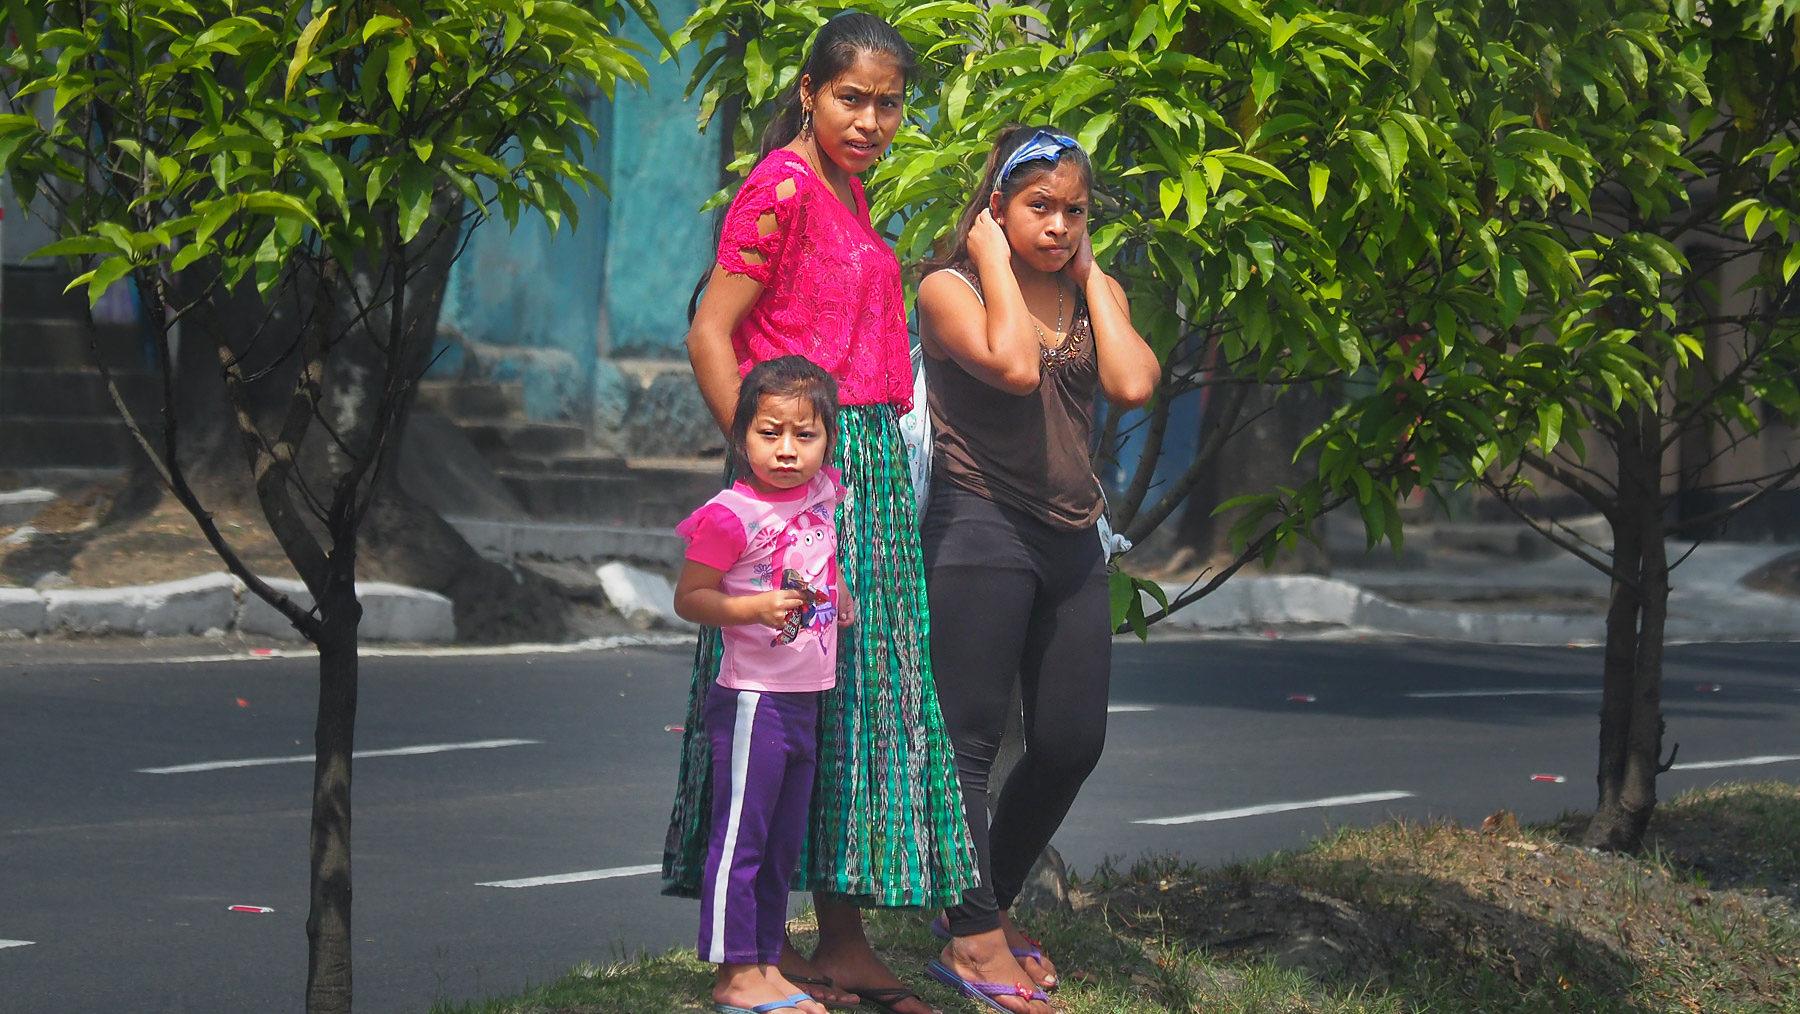 Hochlandindios in Guatemala City